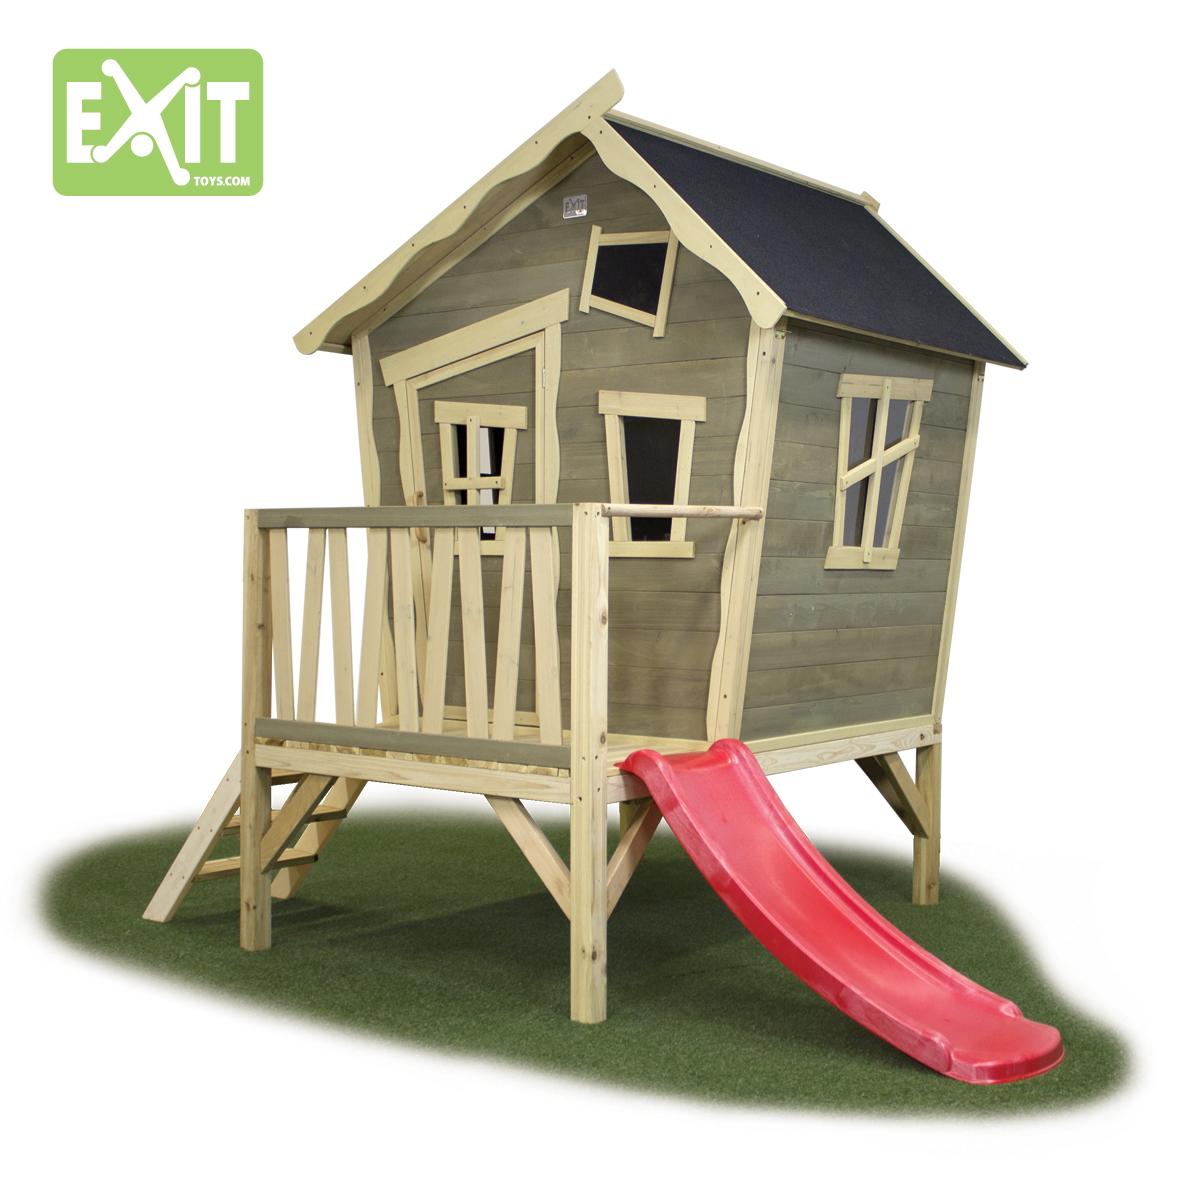 kinder spielhaus exit crooky 300 kinderspielhaus. Black Bedroom Furniture Sets. Home Design Ideas